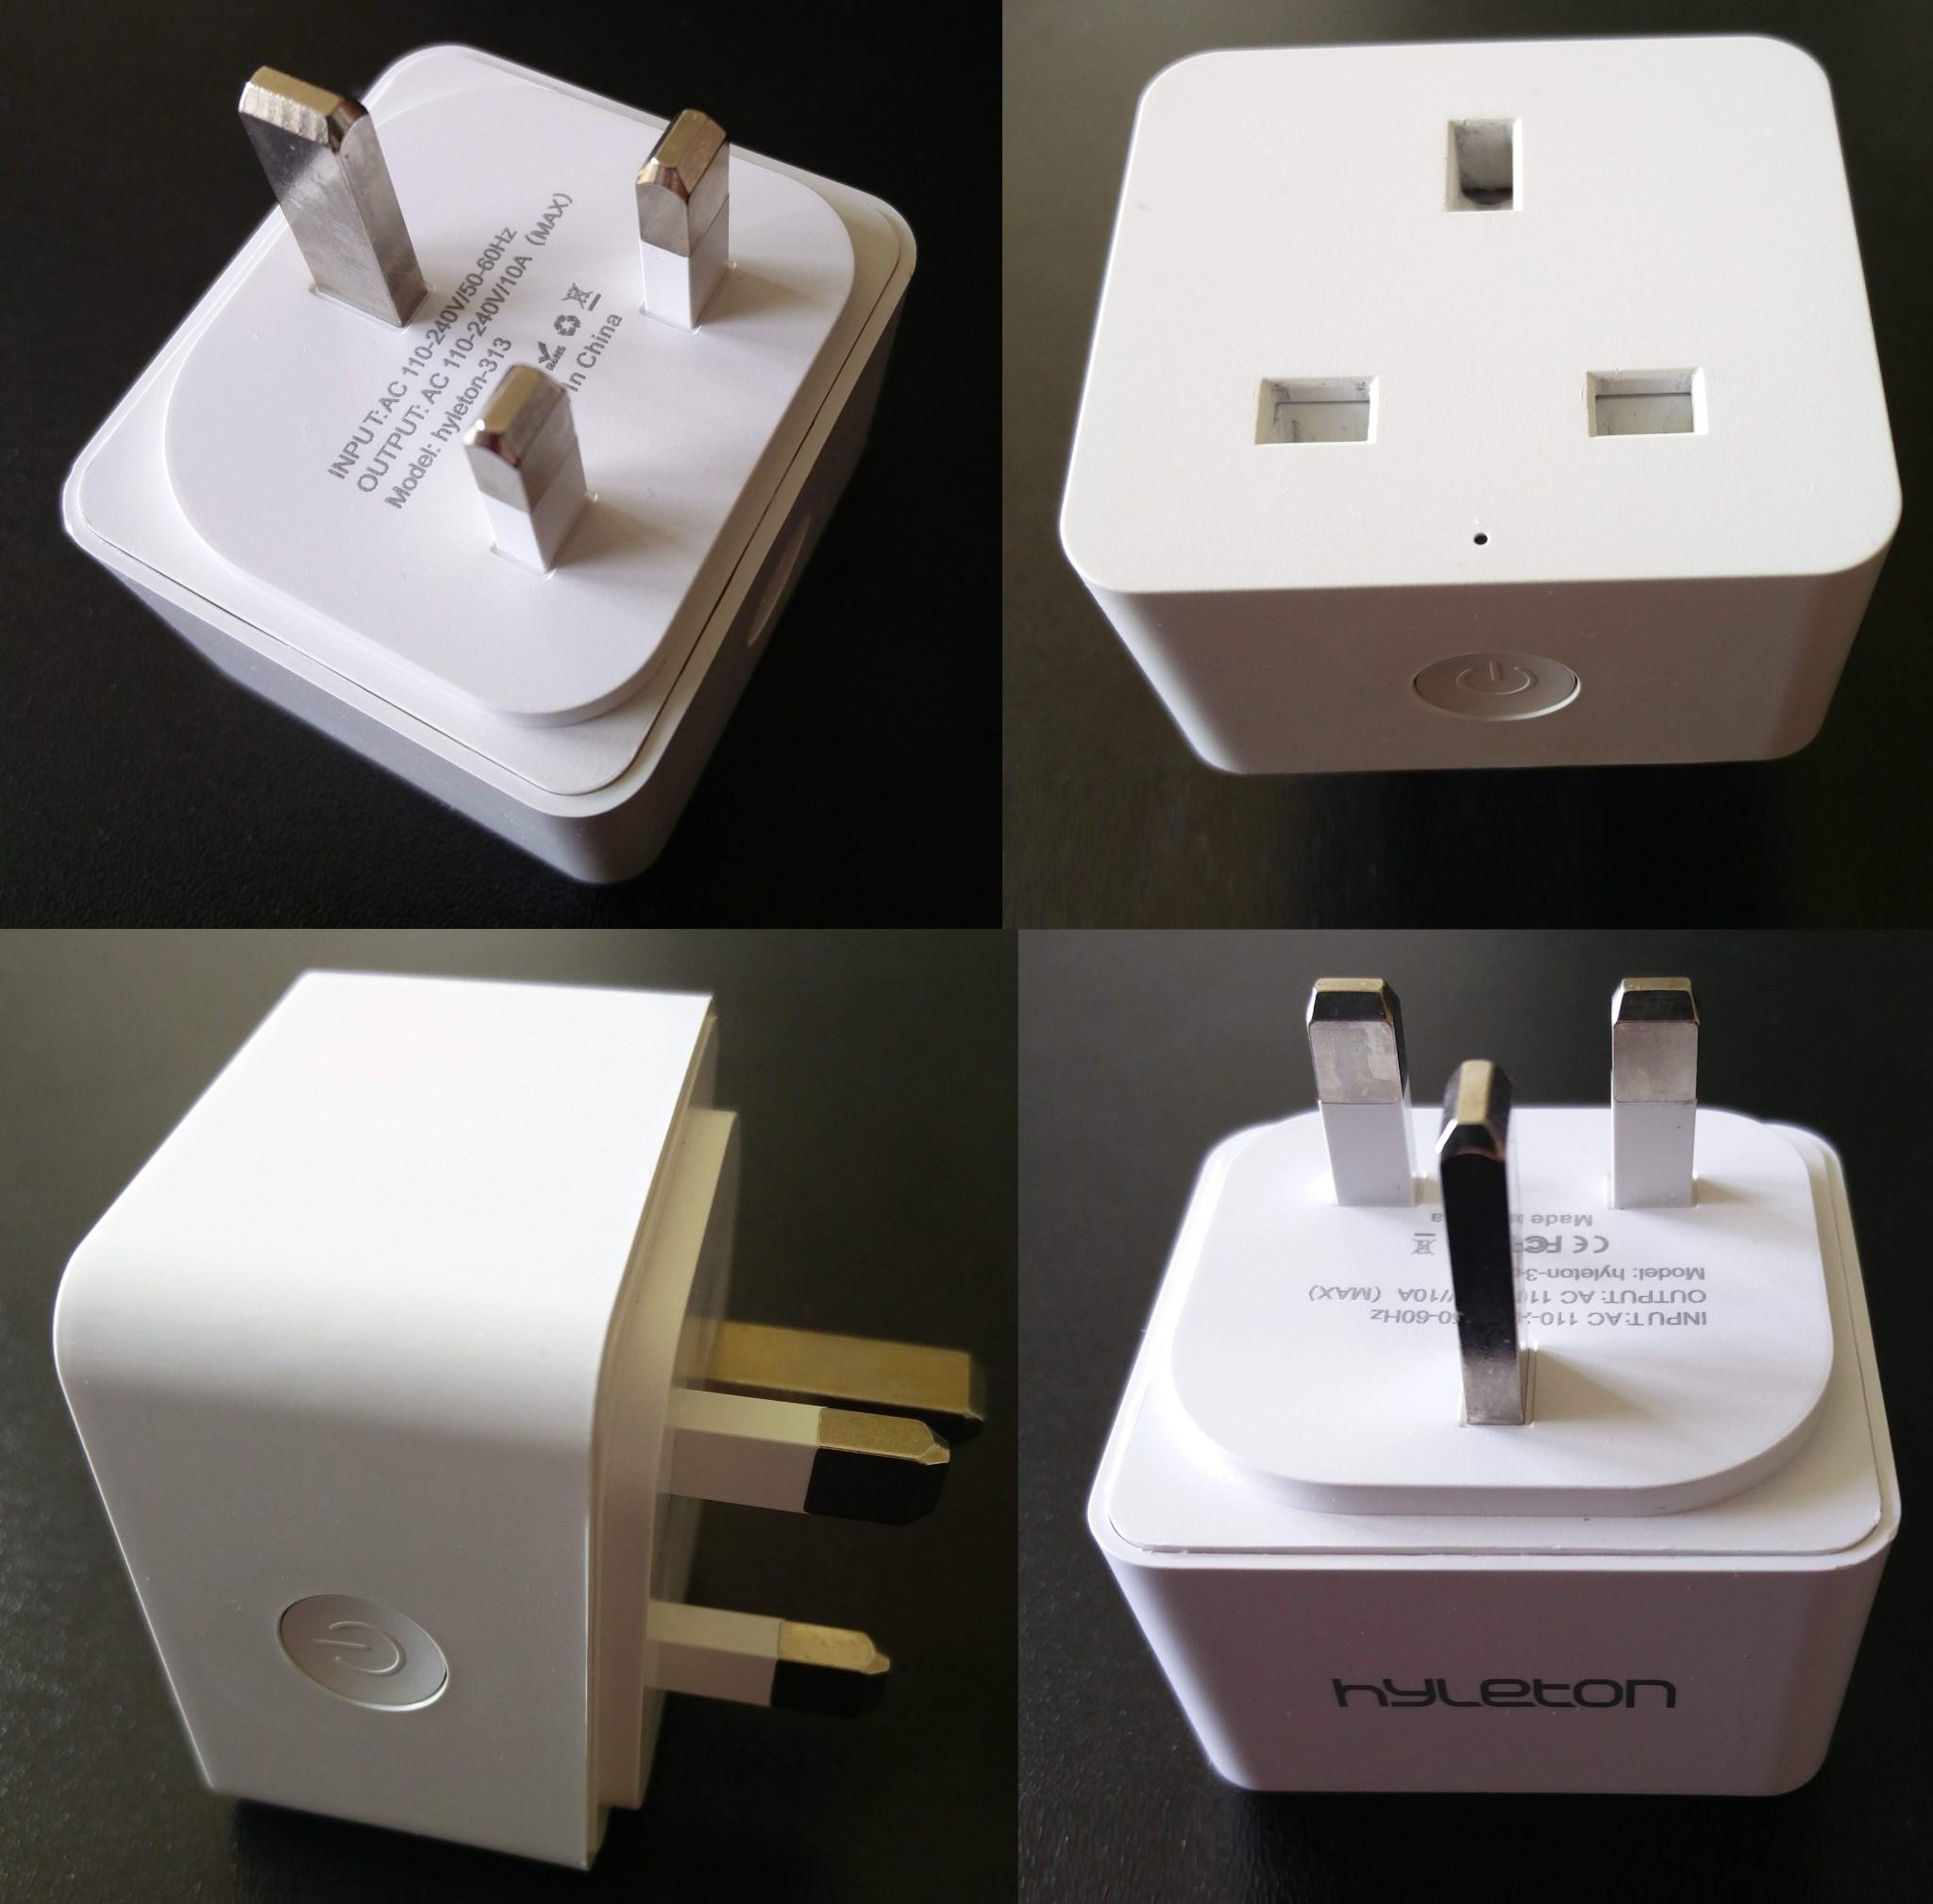 Hyleton 313 Smart Plug · arendst/Sonoff-Tasmota Wiki · GitHub